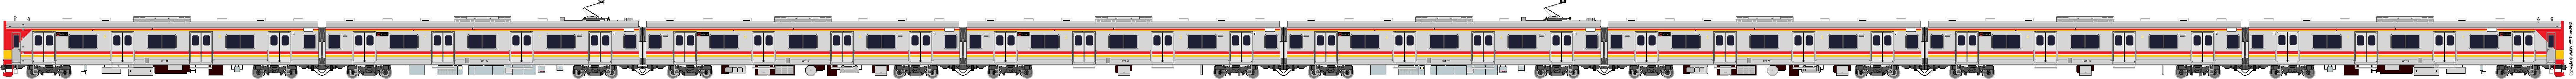 [5415] KAI Commuter Jabodetabek 5415